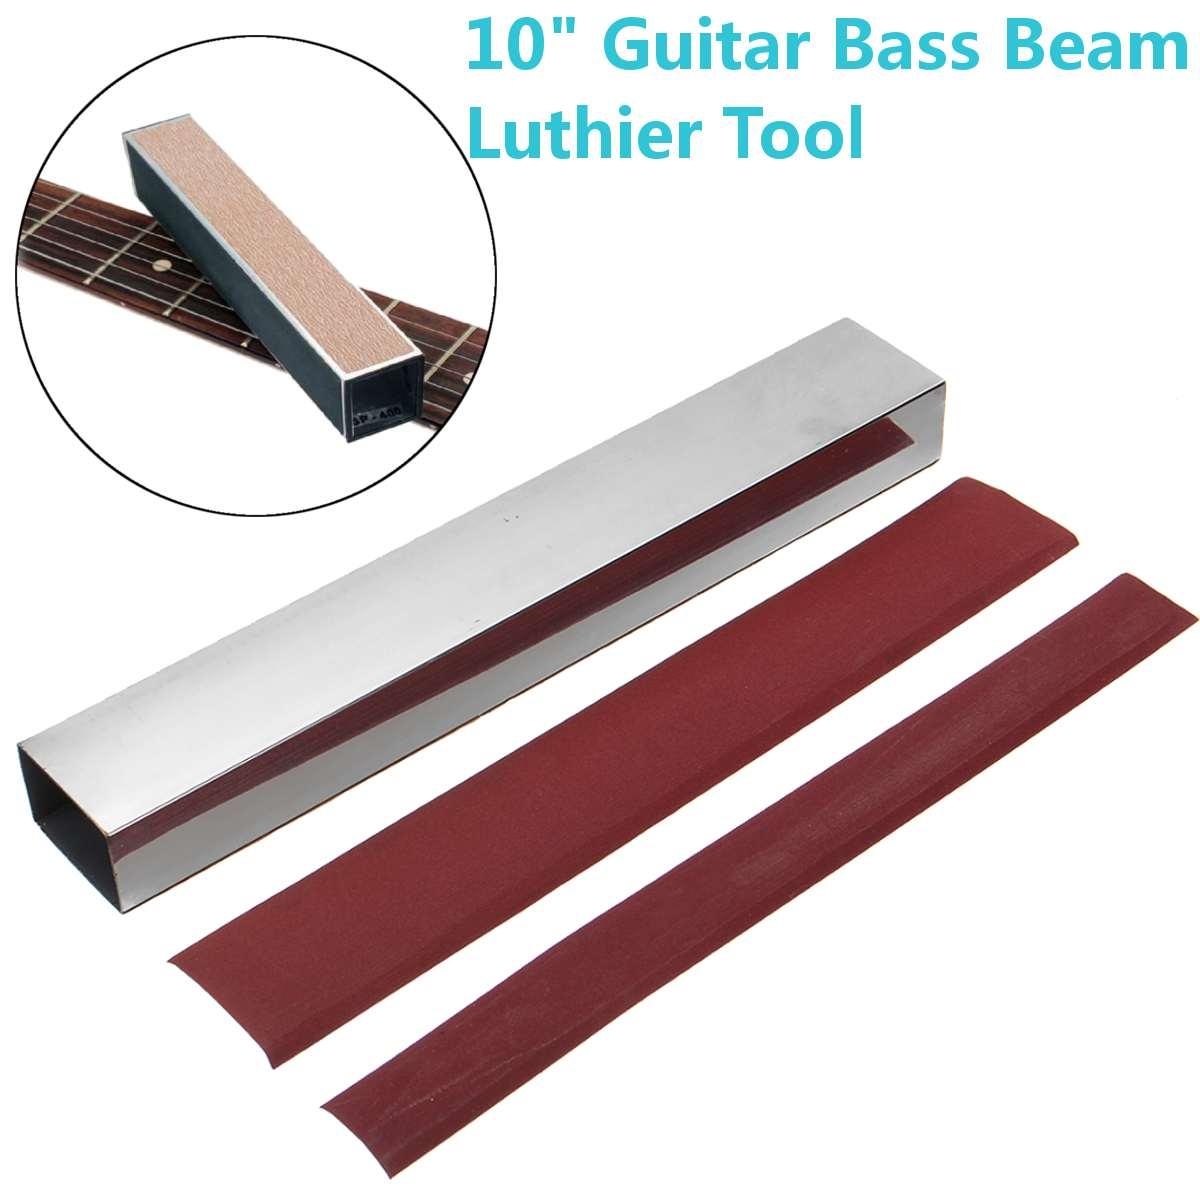 Guitar Bass Neck Sanding Tool Guitar Fret Leveler Leveling Aluminum Alloy Beam Luthier Tools Sandpaper Guitar Parts Accessories|Guitar Parts & Accessories|   - AliExpress